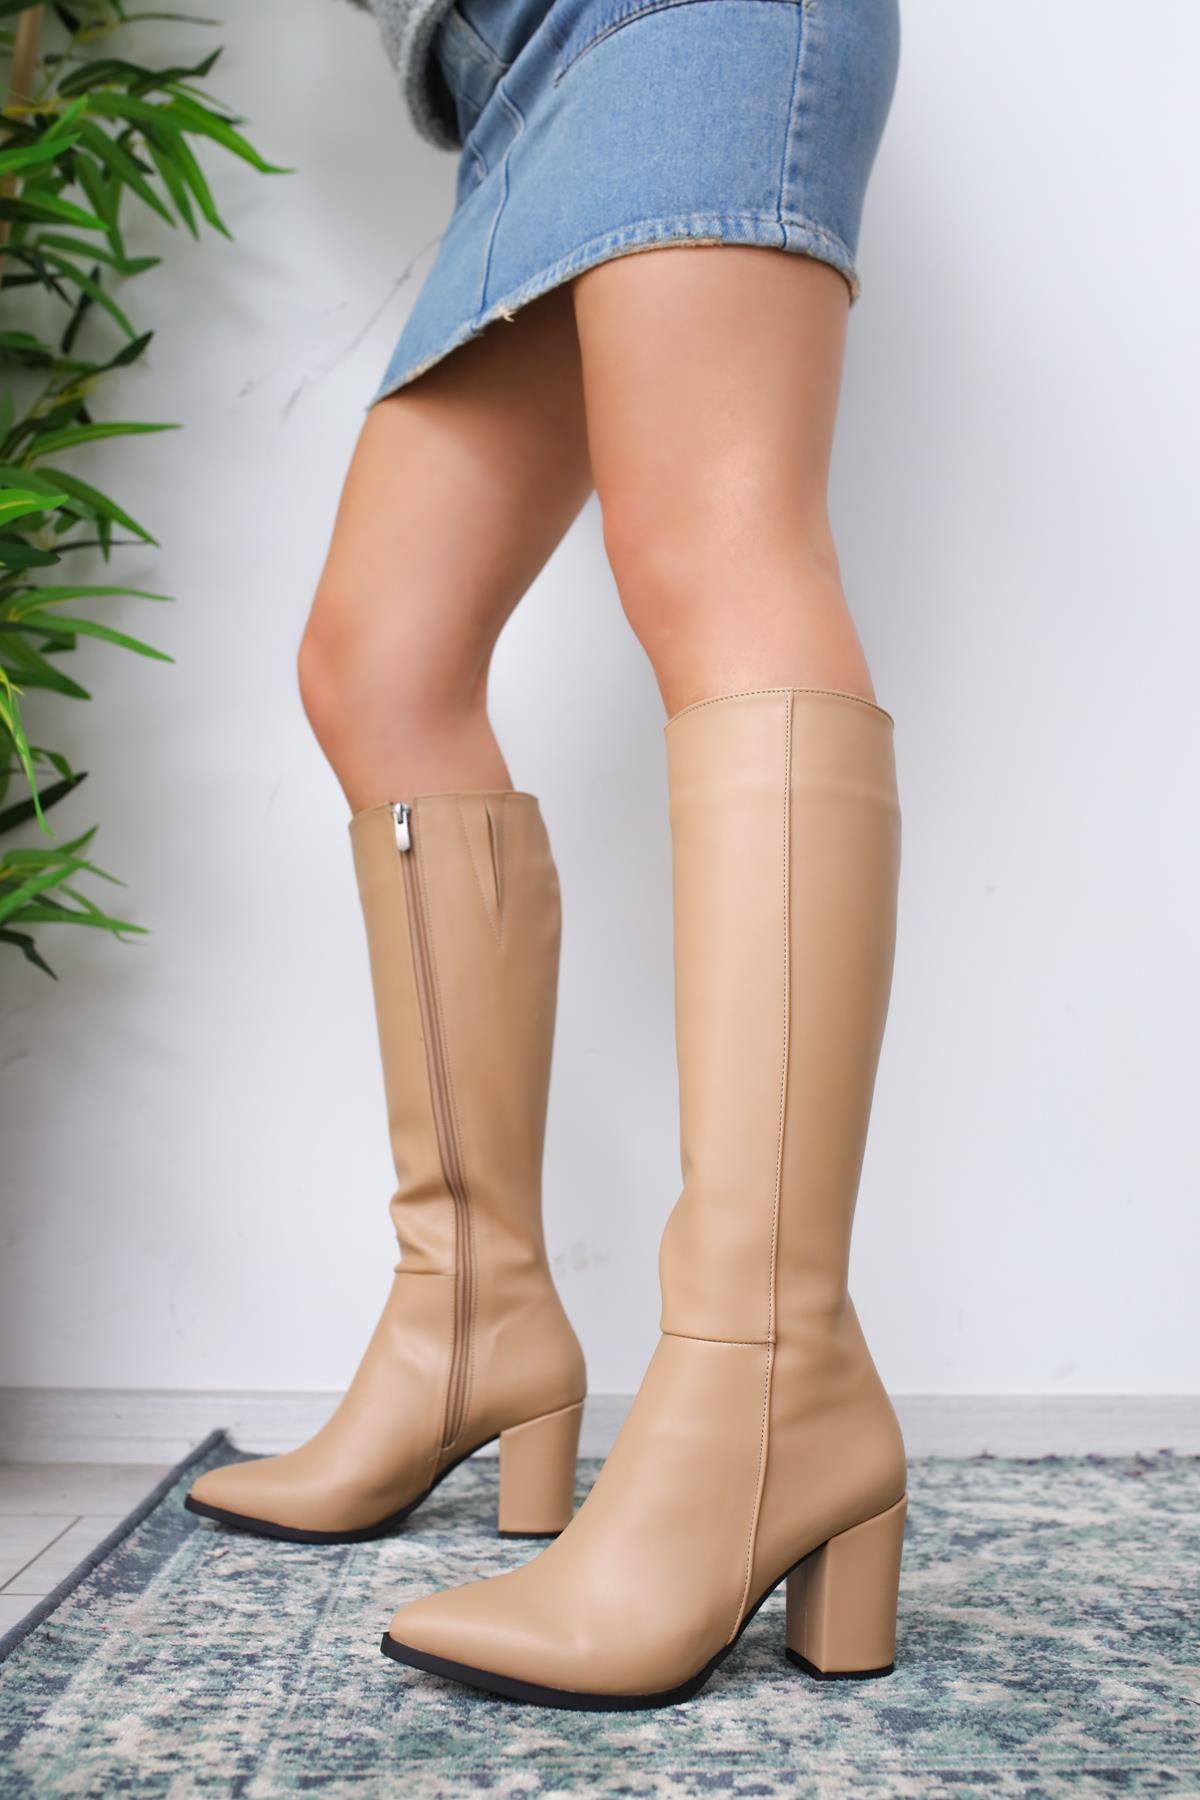 Limoya Tatum Nud Sivri Burunlu Orta Topuklu Çizme 1